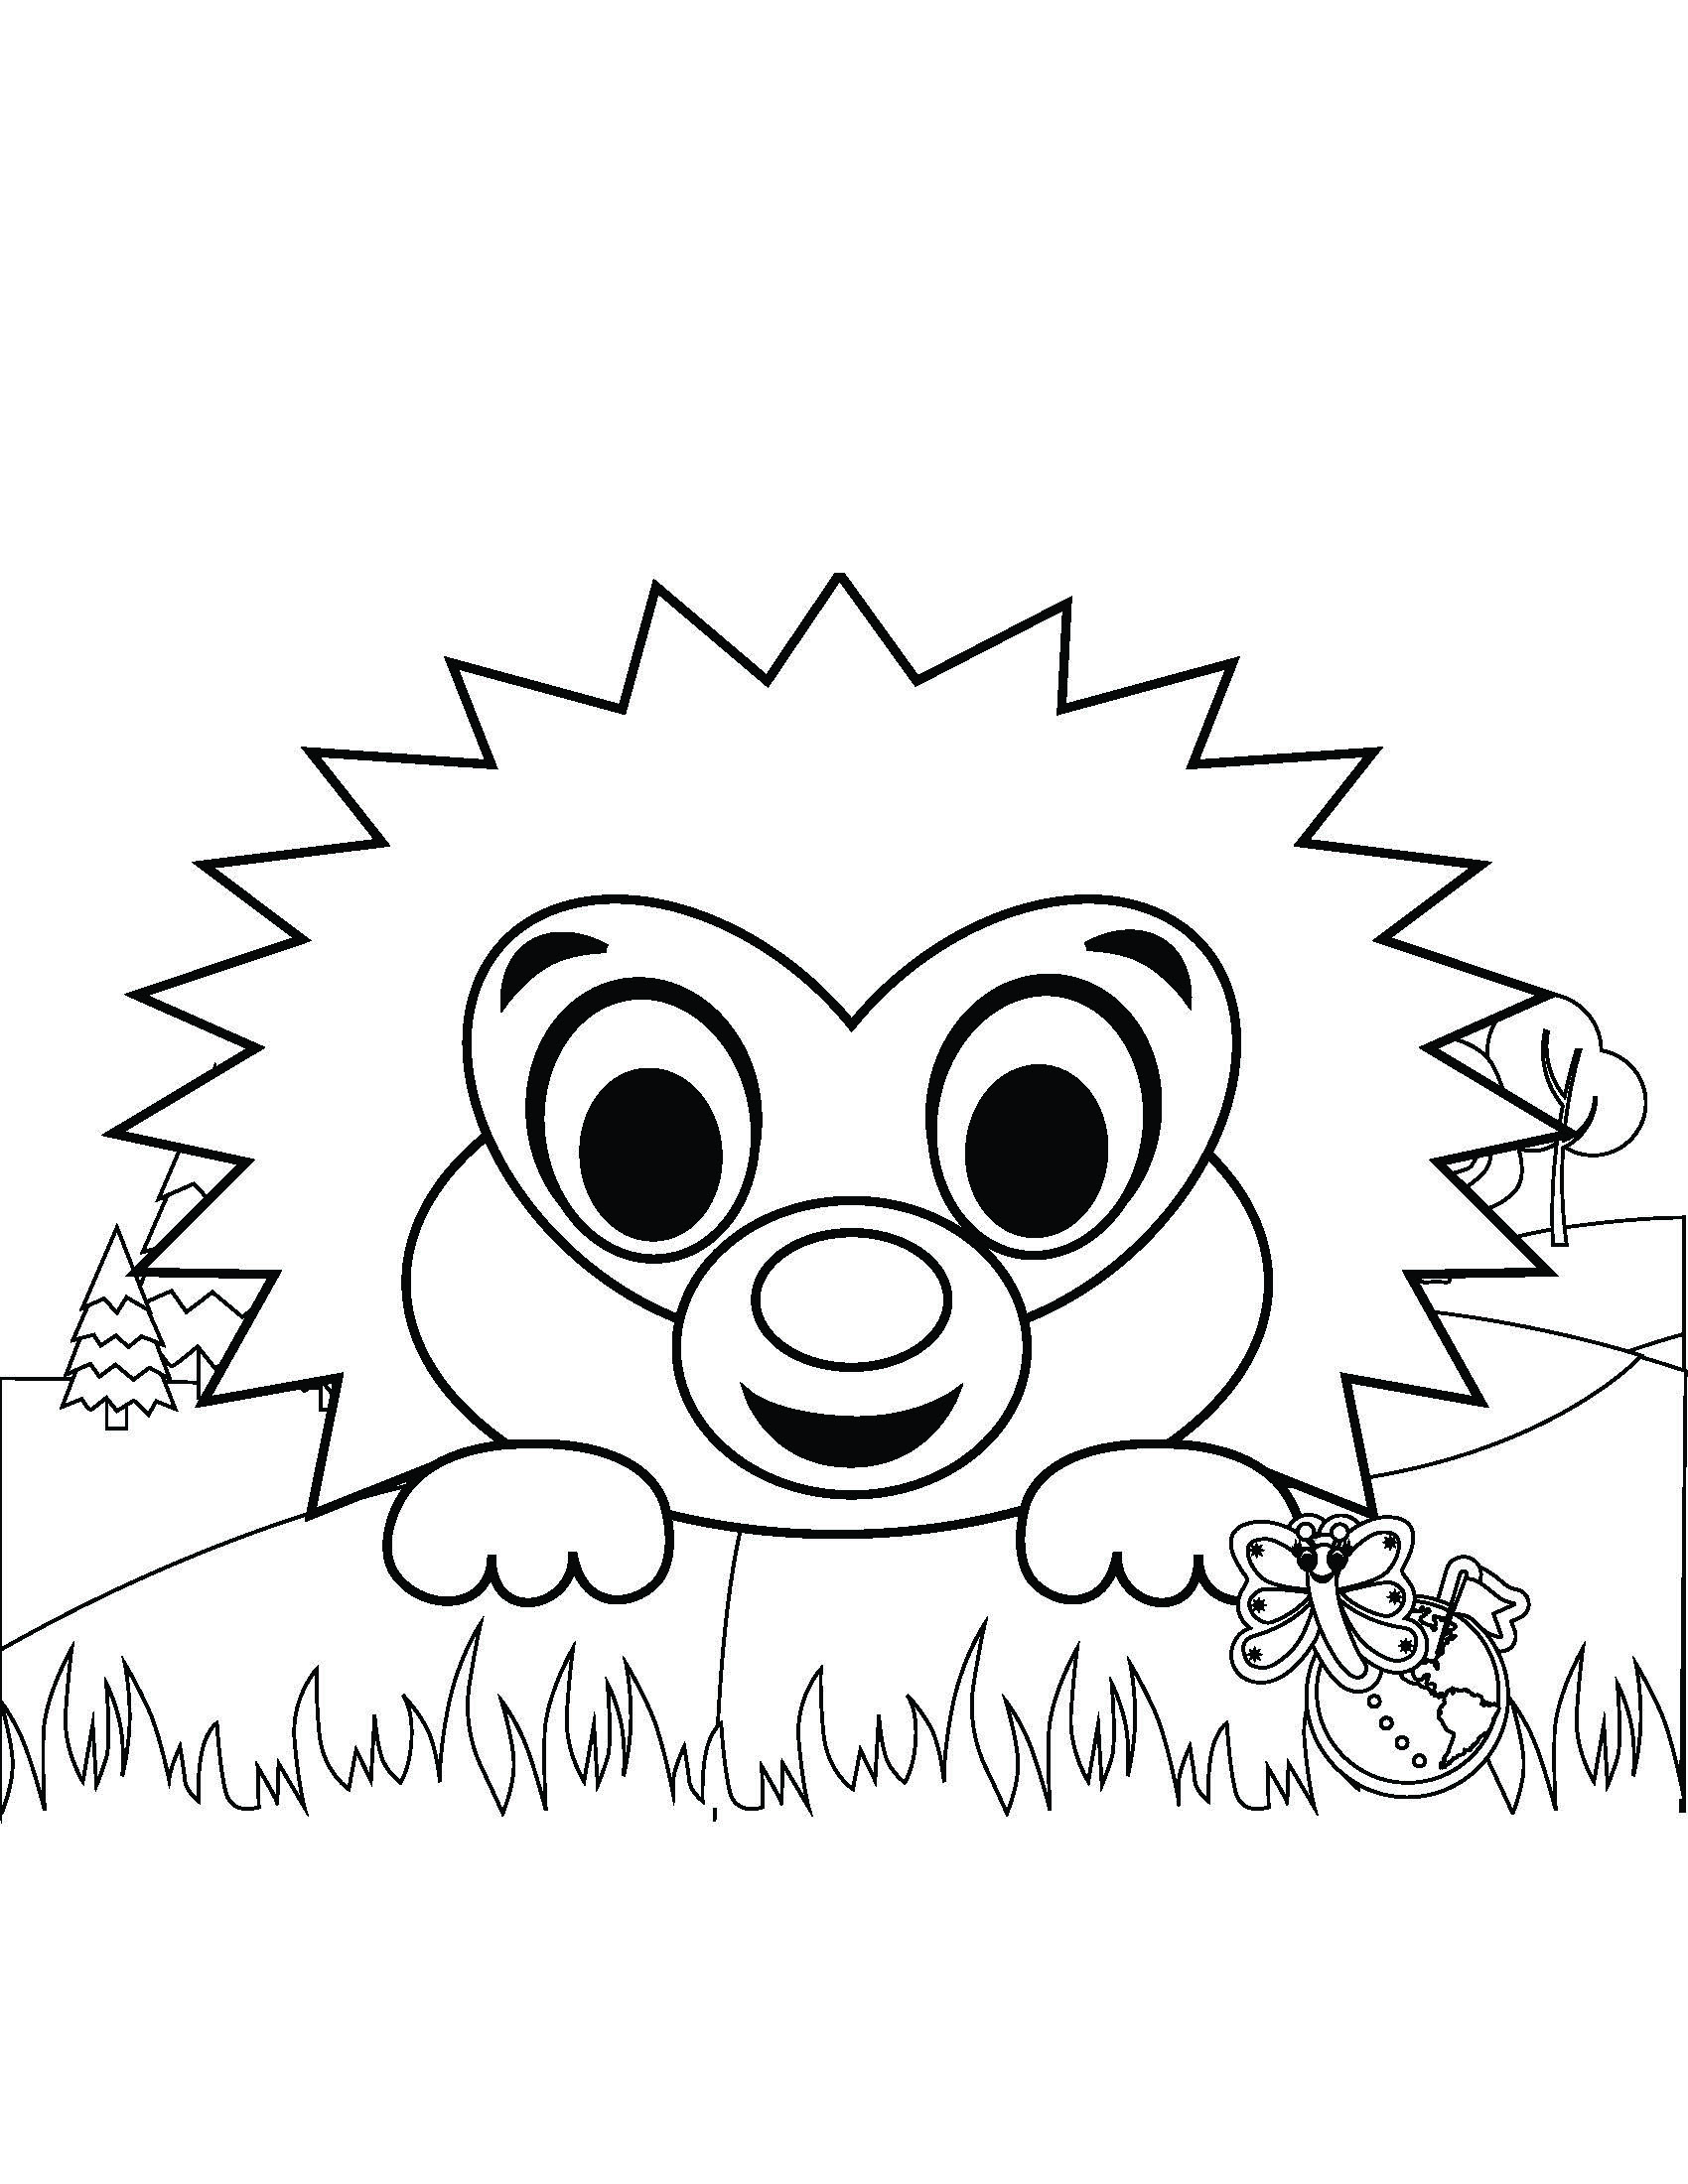 Hudson the Hedgehog